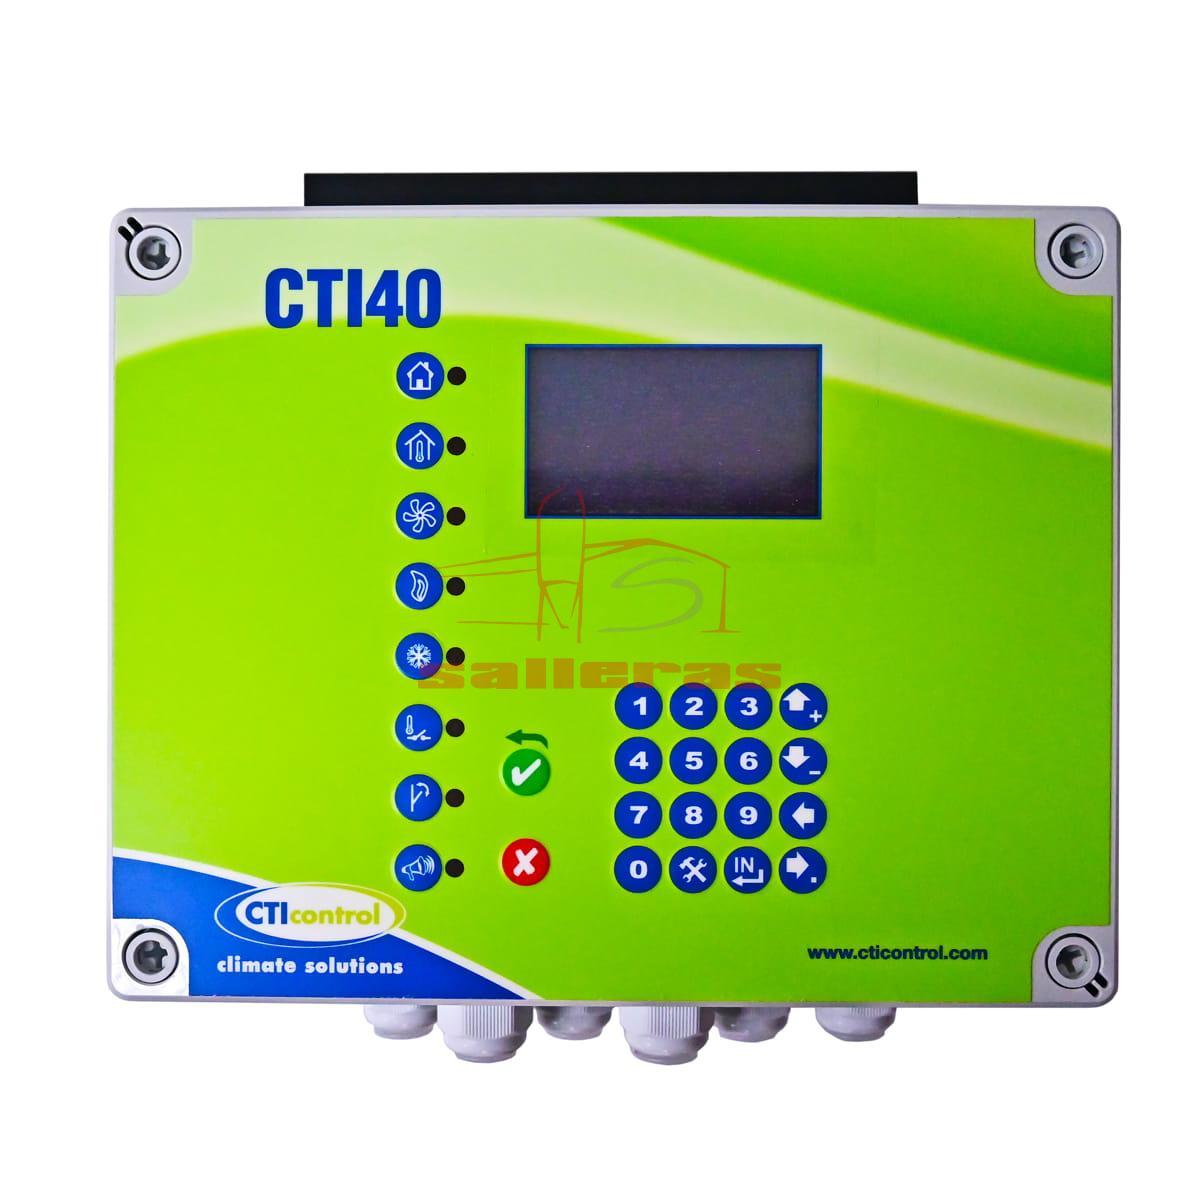 Regulador cti 40 de 15 amperios